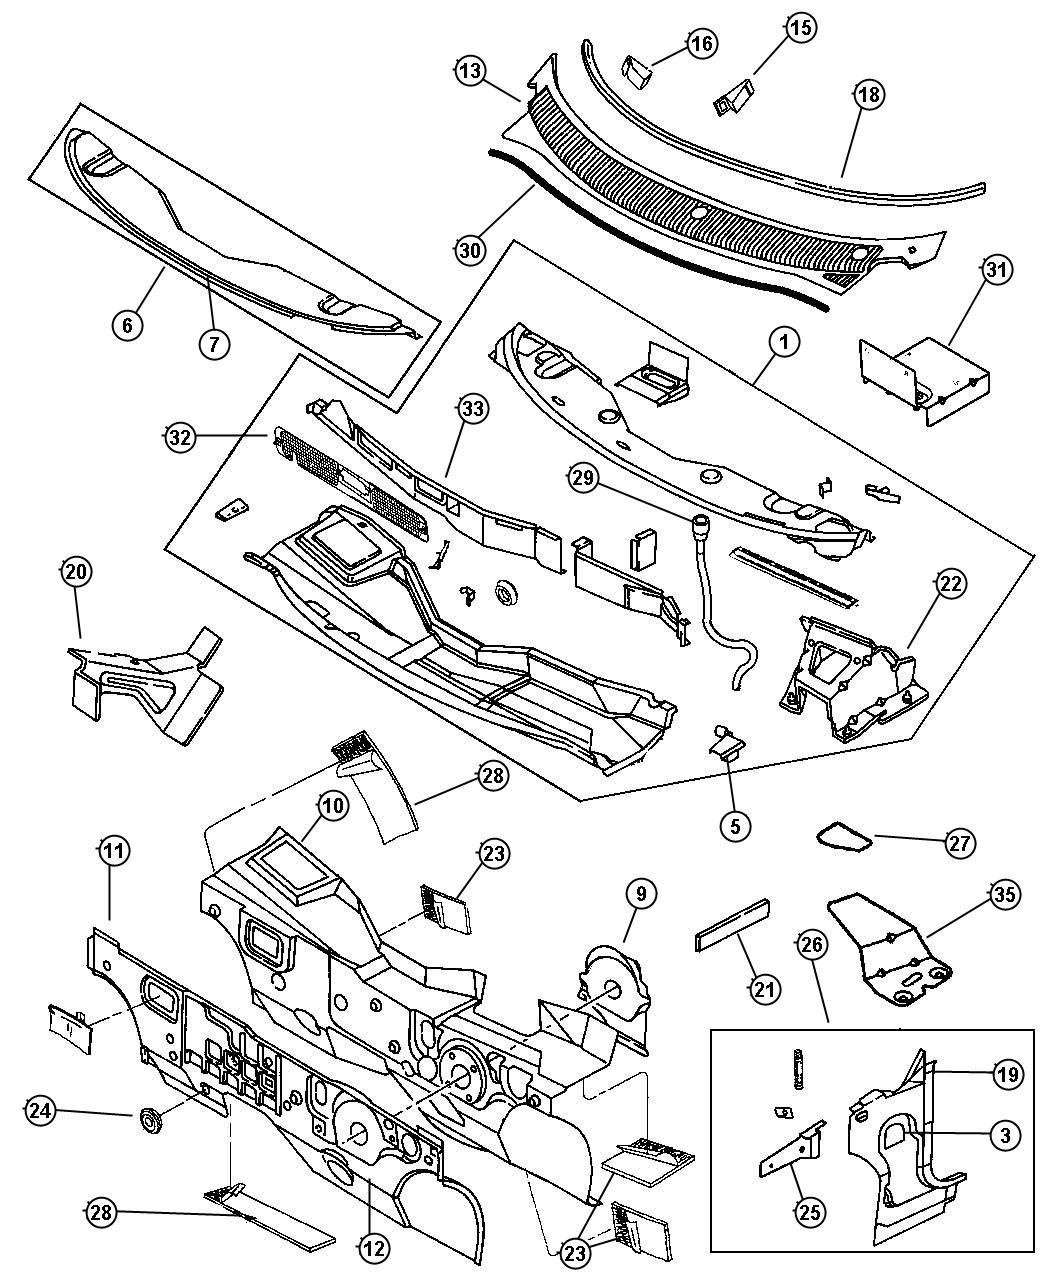 1995 Dodge Neon Damper. Cowl plenum. Panel, dash, body